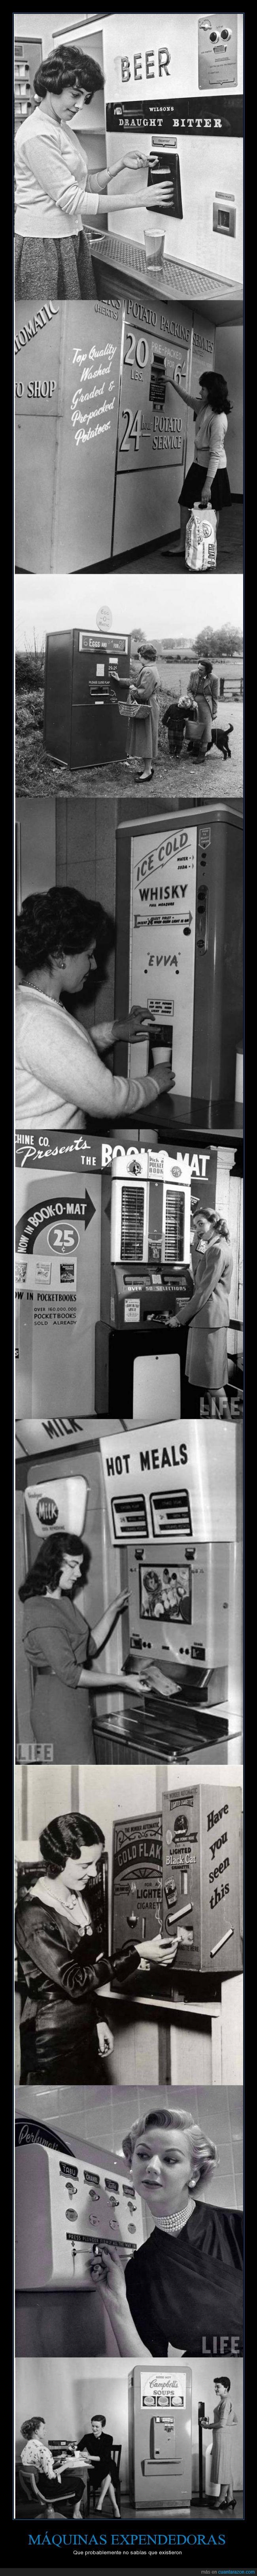 cigarrillos,comida,expendedora,machine,maquina,perfume,sopa,tabaco,vender,vending